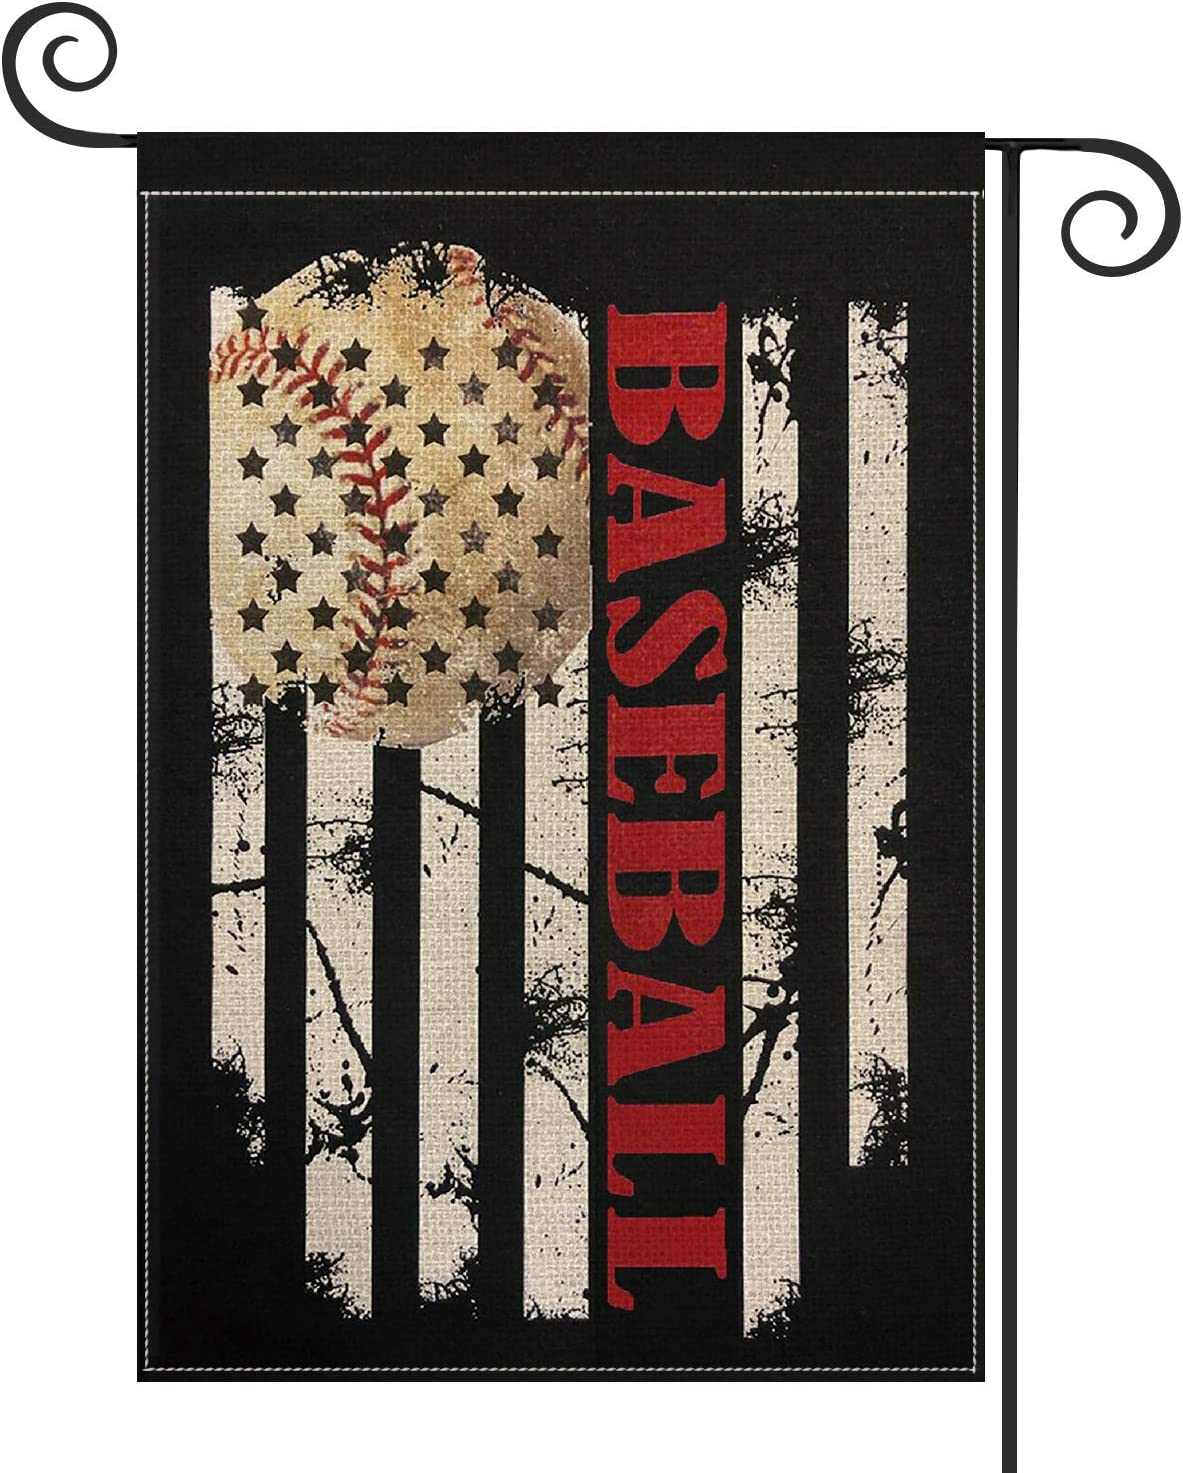 AVOIN Baseball Garden Flag Vertical Double Sided, Bat Ball Sport Rustic Stripes Flag Yard Outdoor Decoration 12.5 x 18 Inch